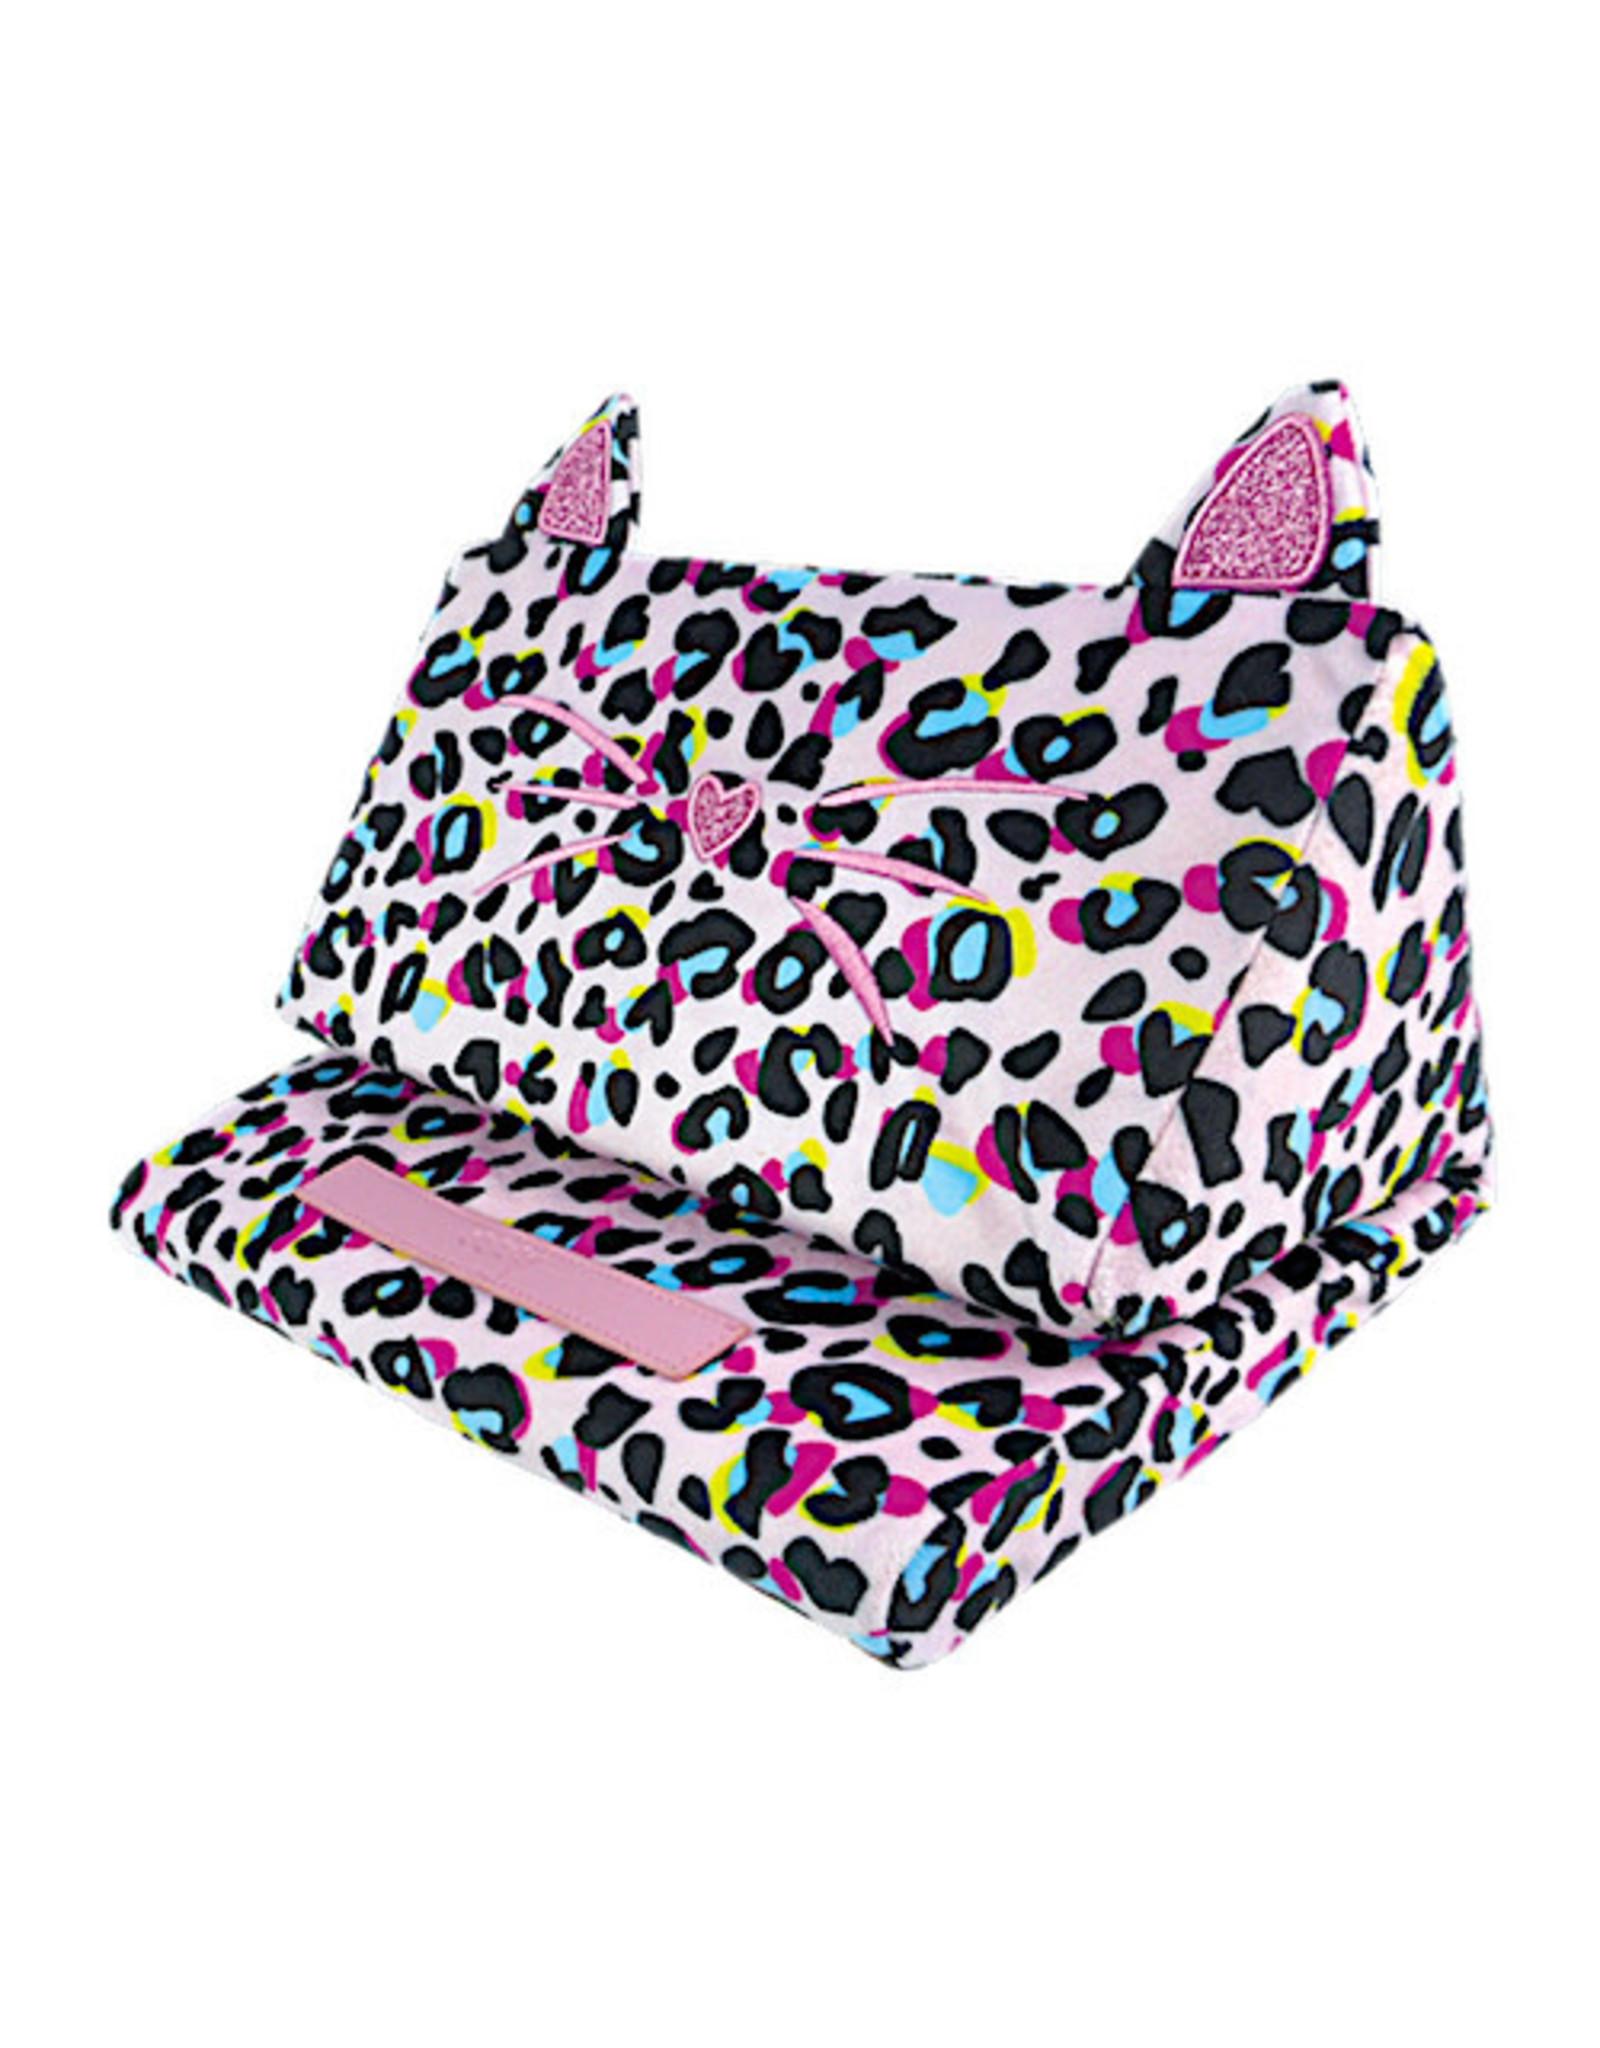 Iscream Pink Leopard Tablet Pillow